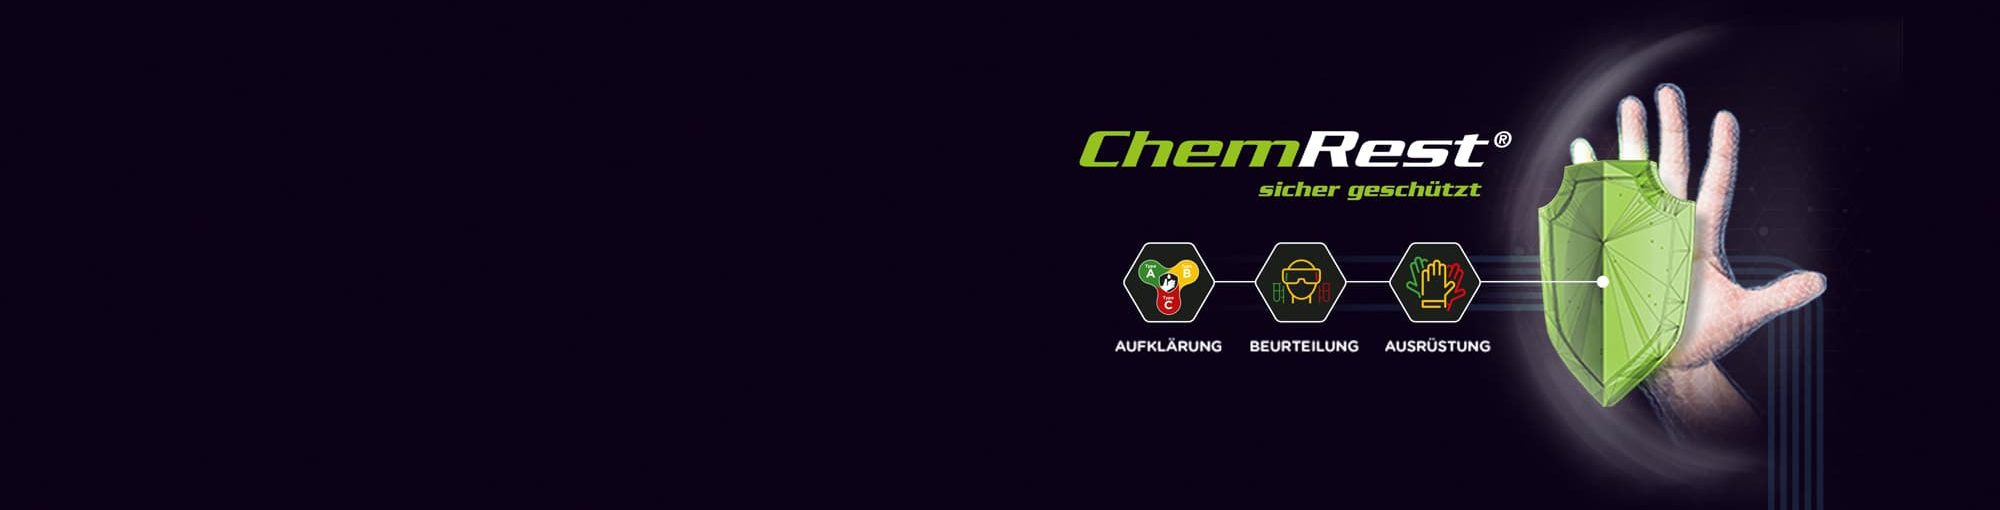 Showa_Chemrest_banner_homepage_v1.0_DE